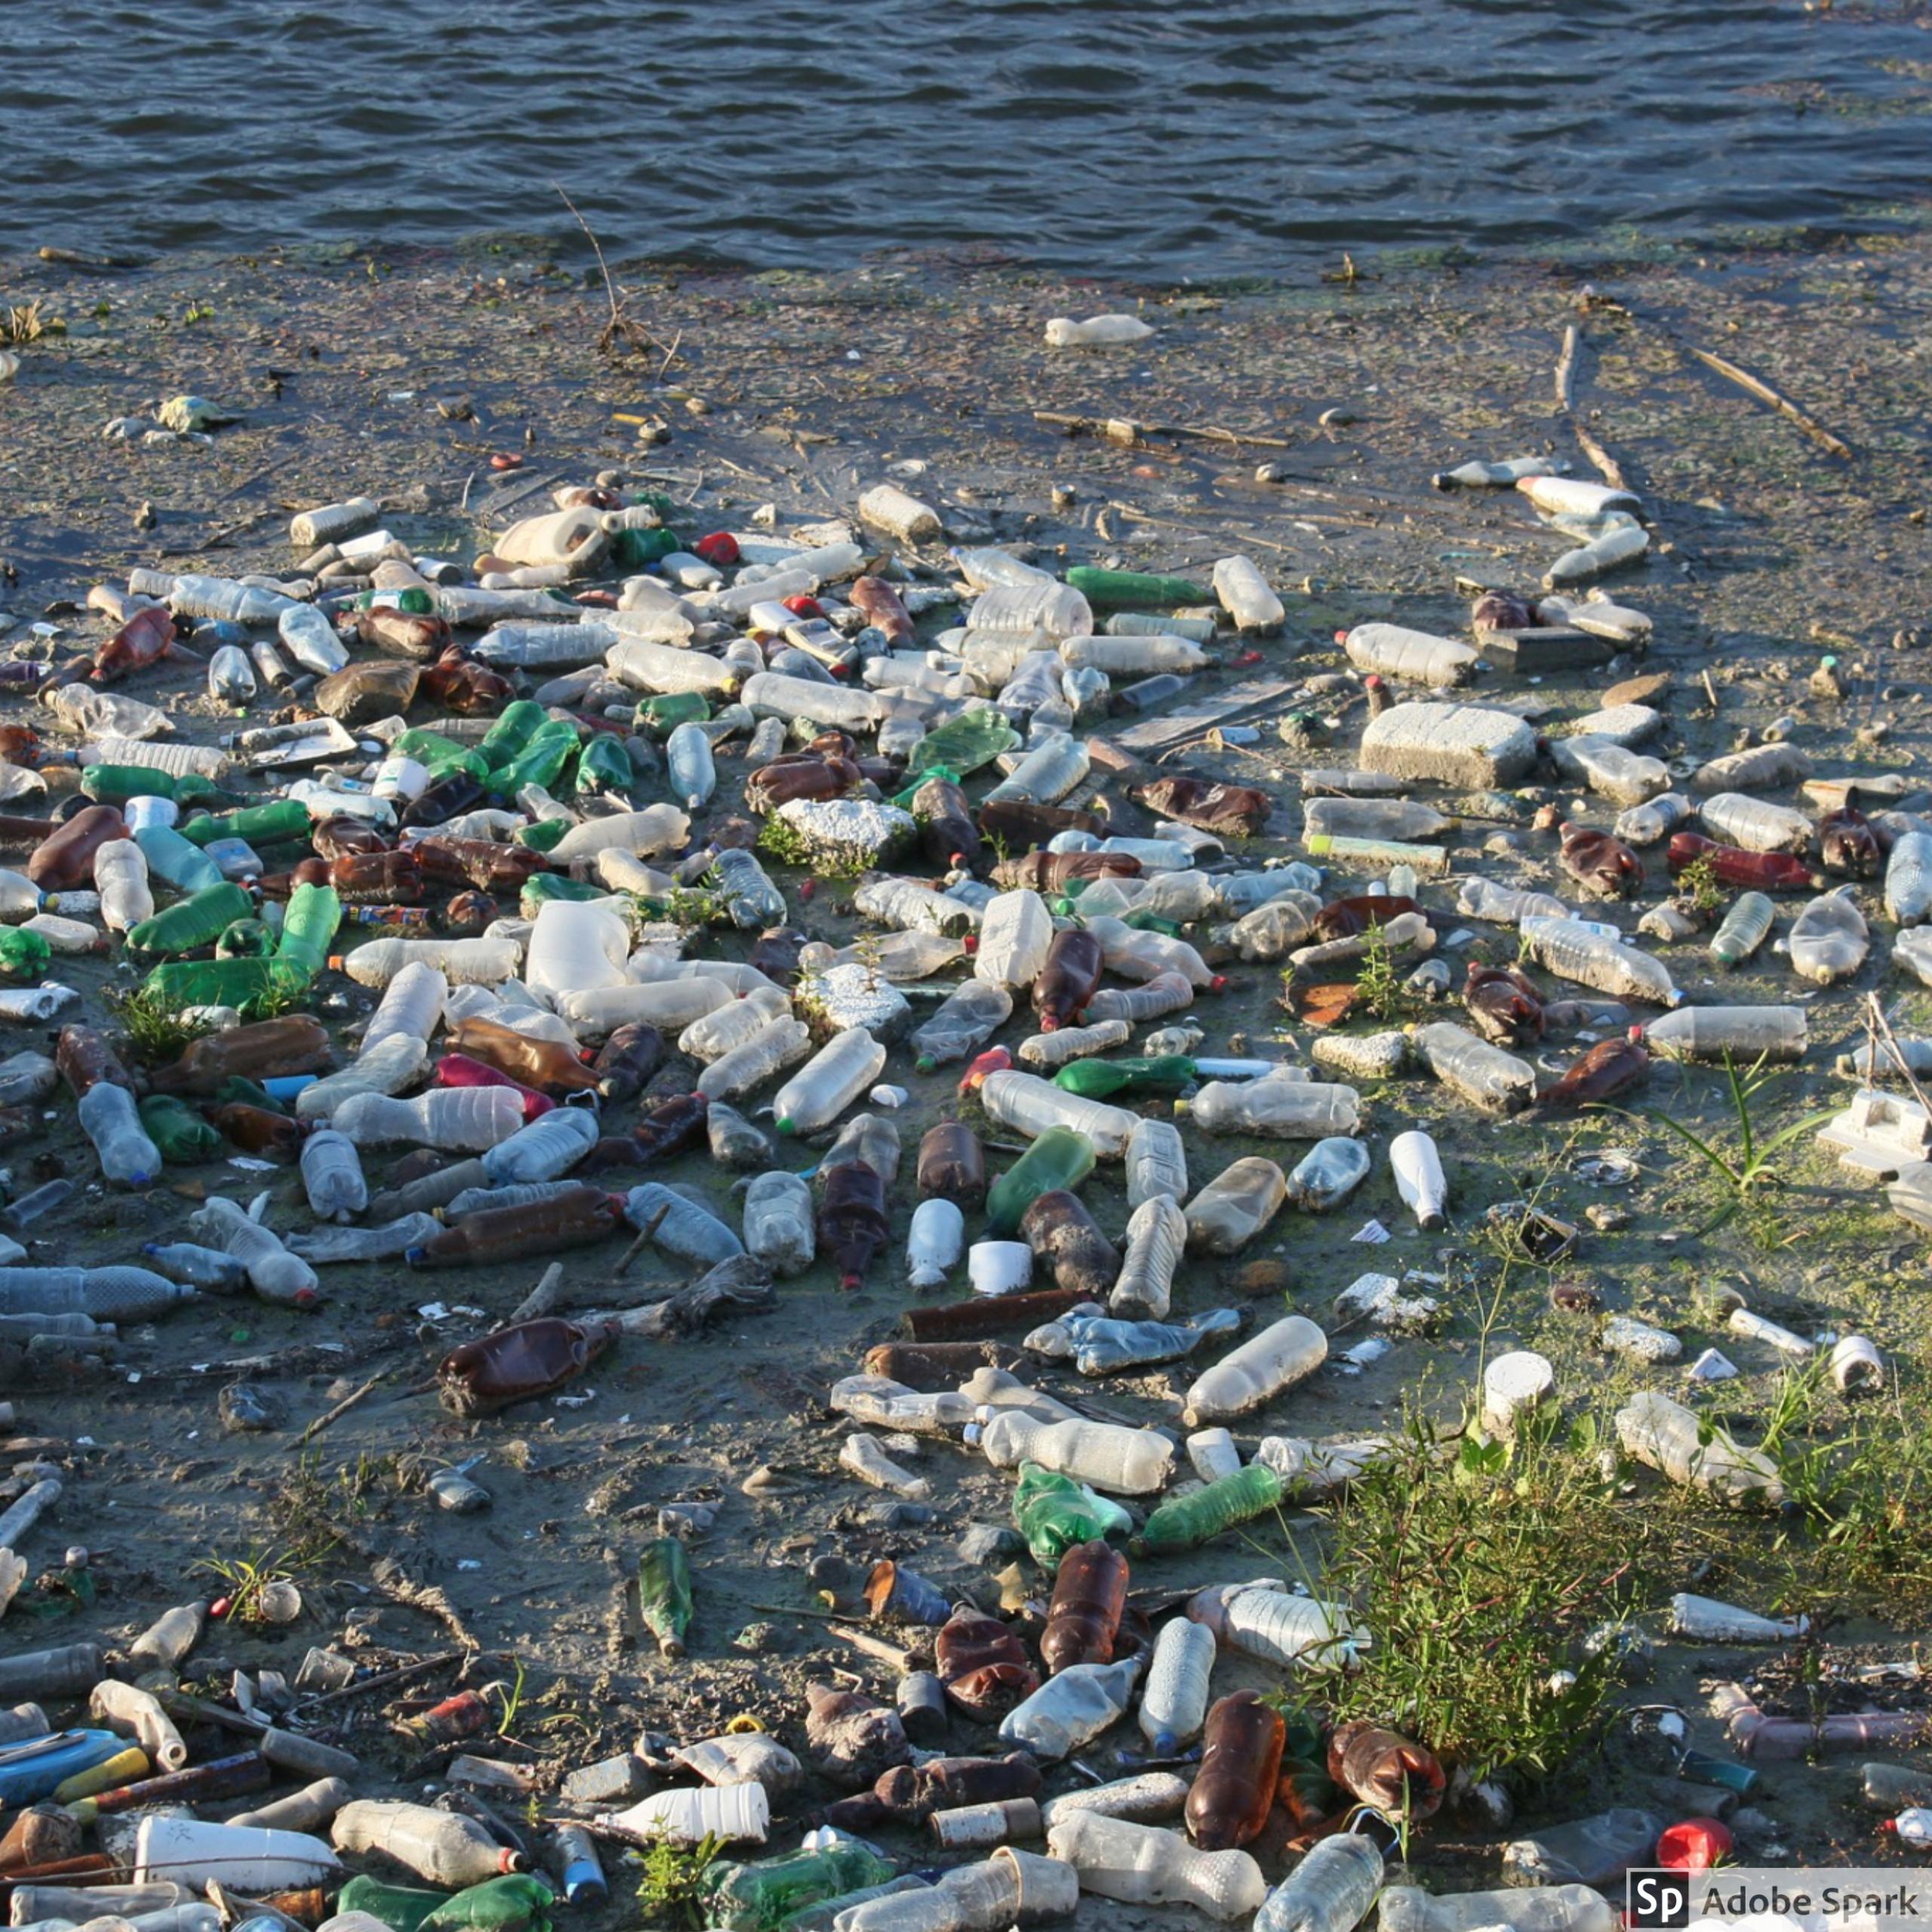 NJ_Plastic Waste_Newsletter Image from Emily